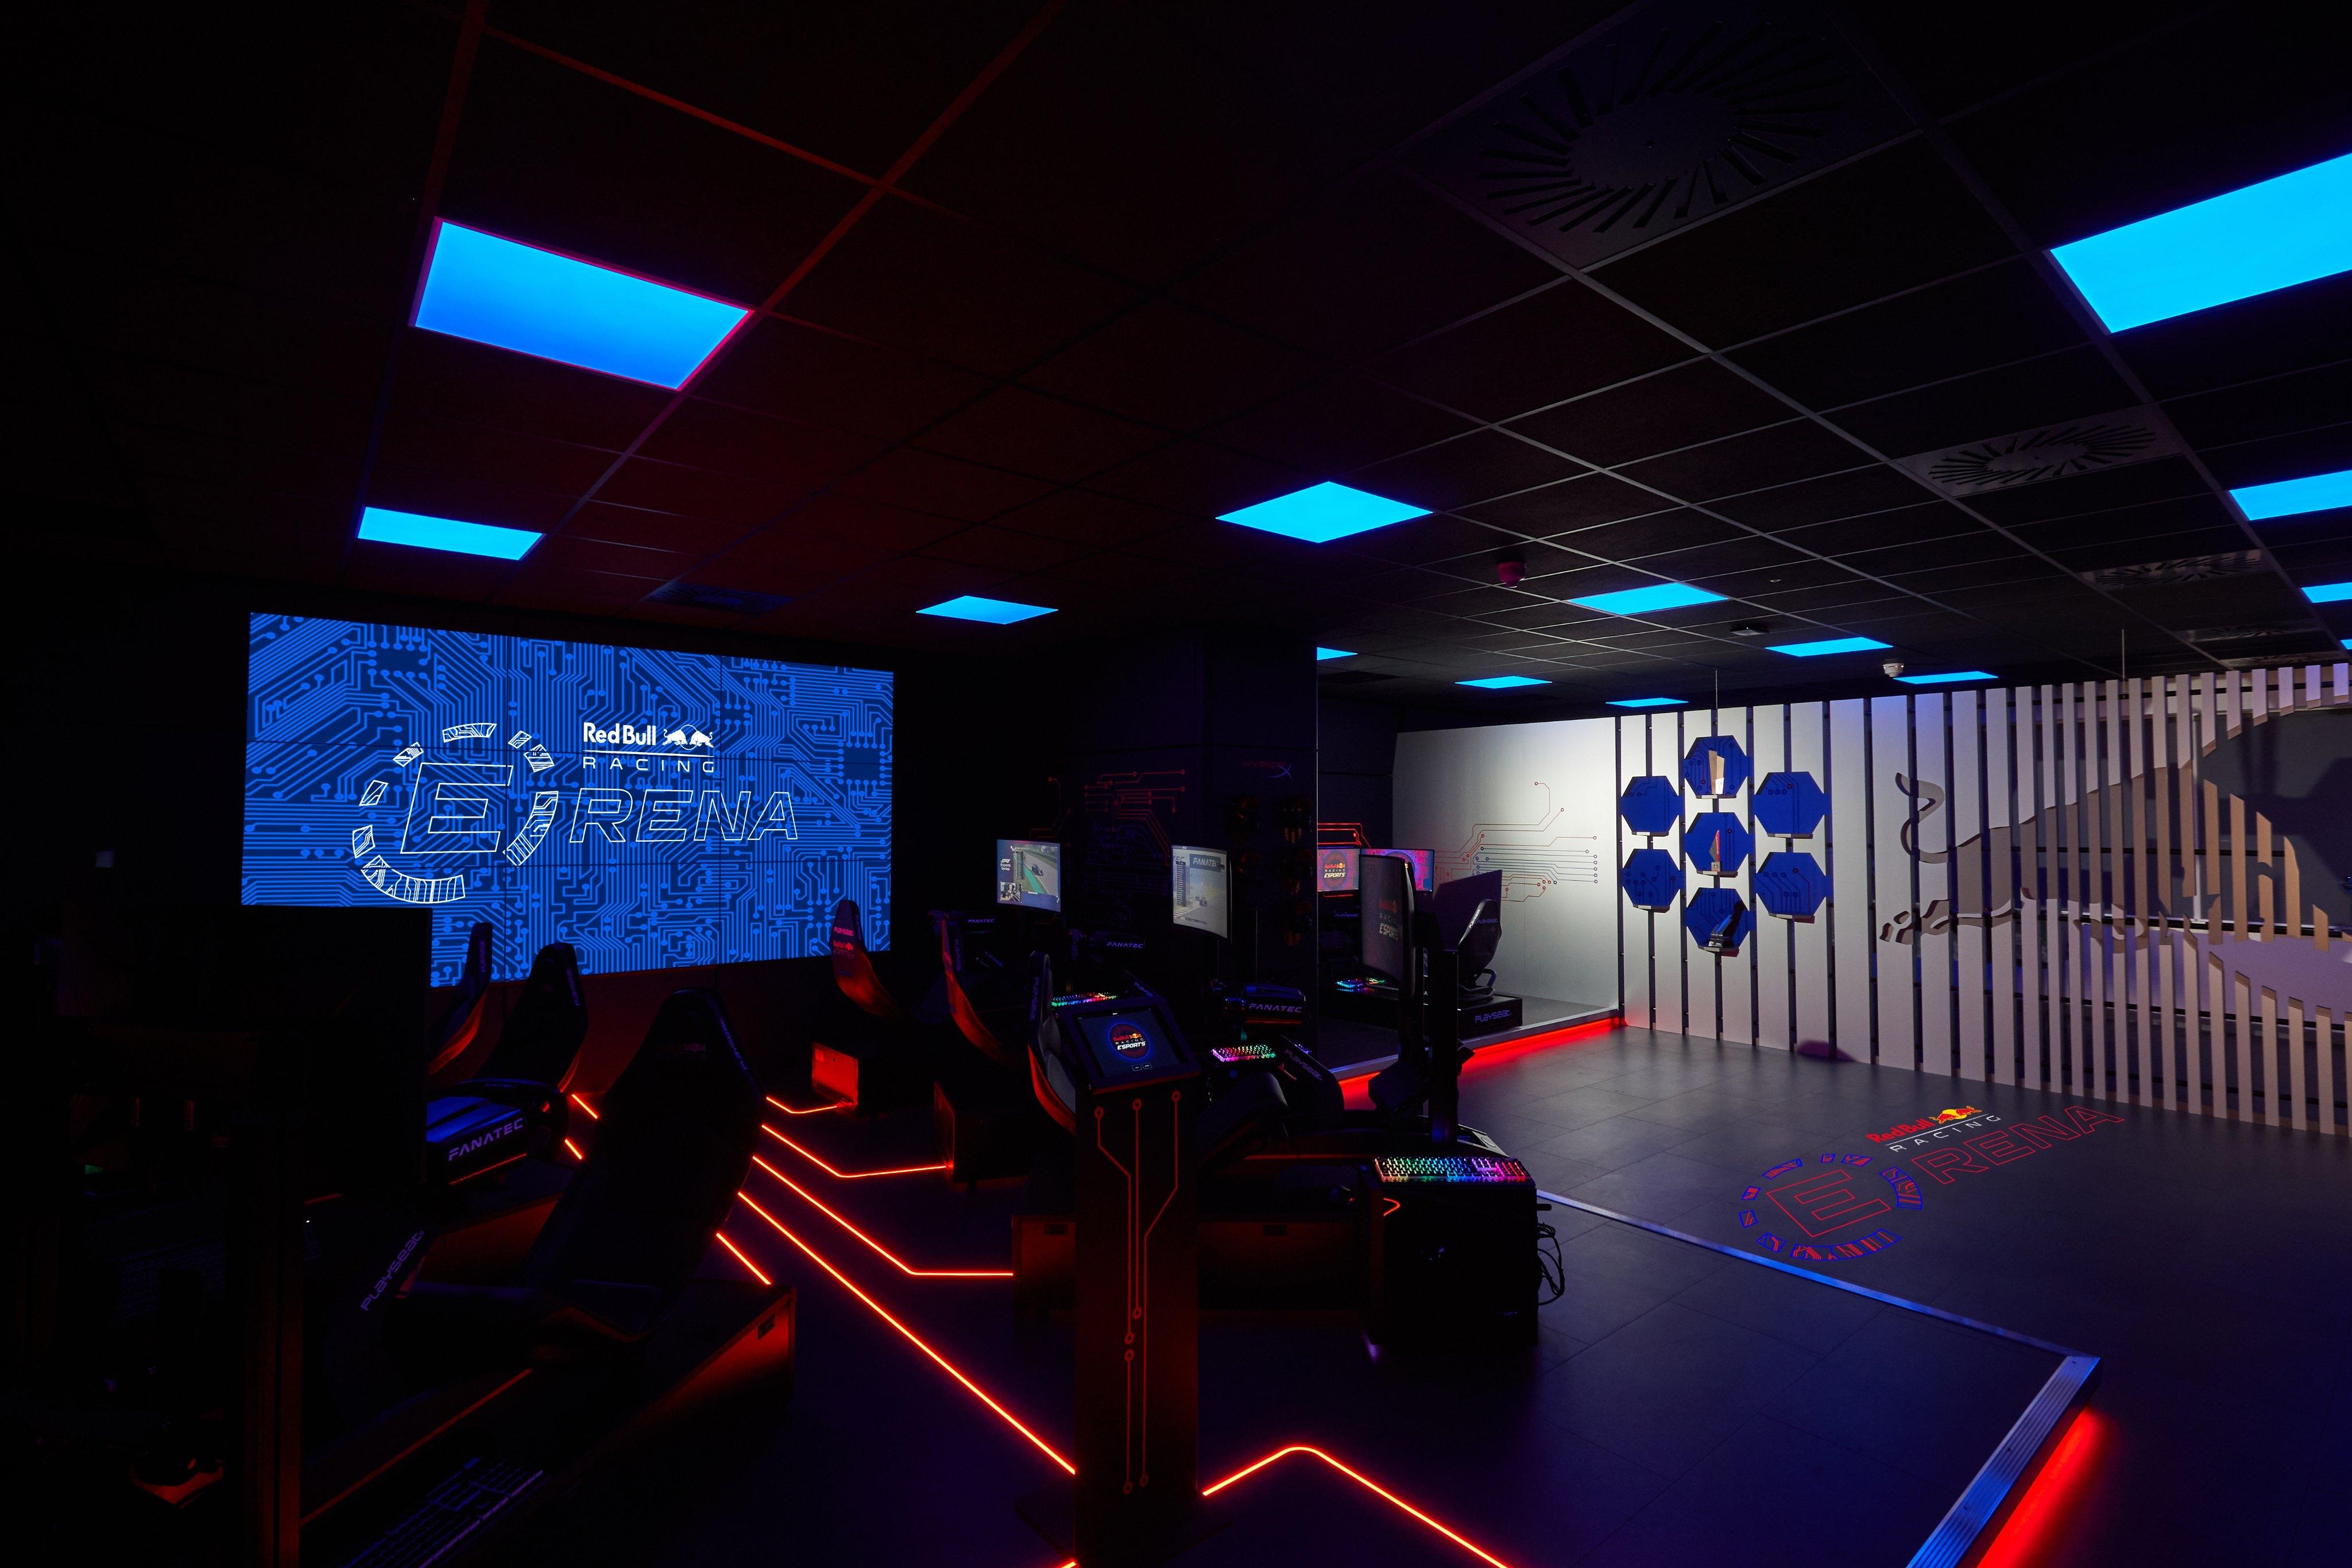 inside of the Red Bull Racing Erena